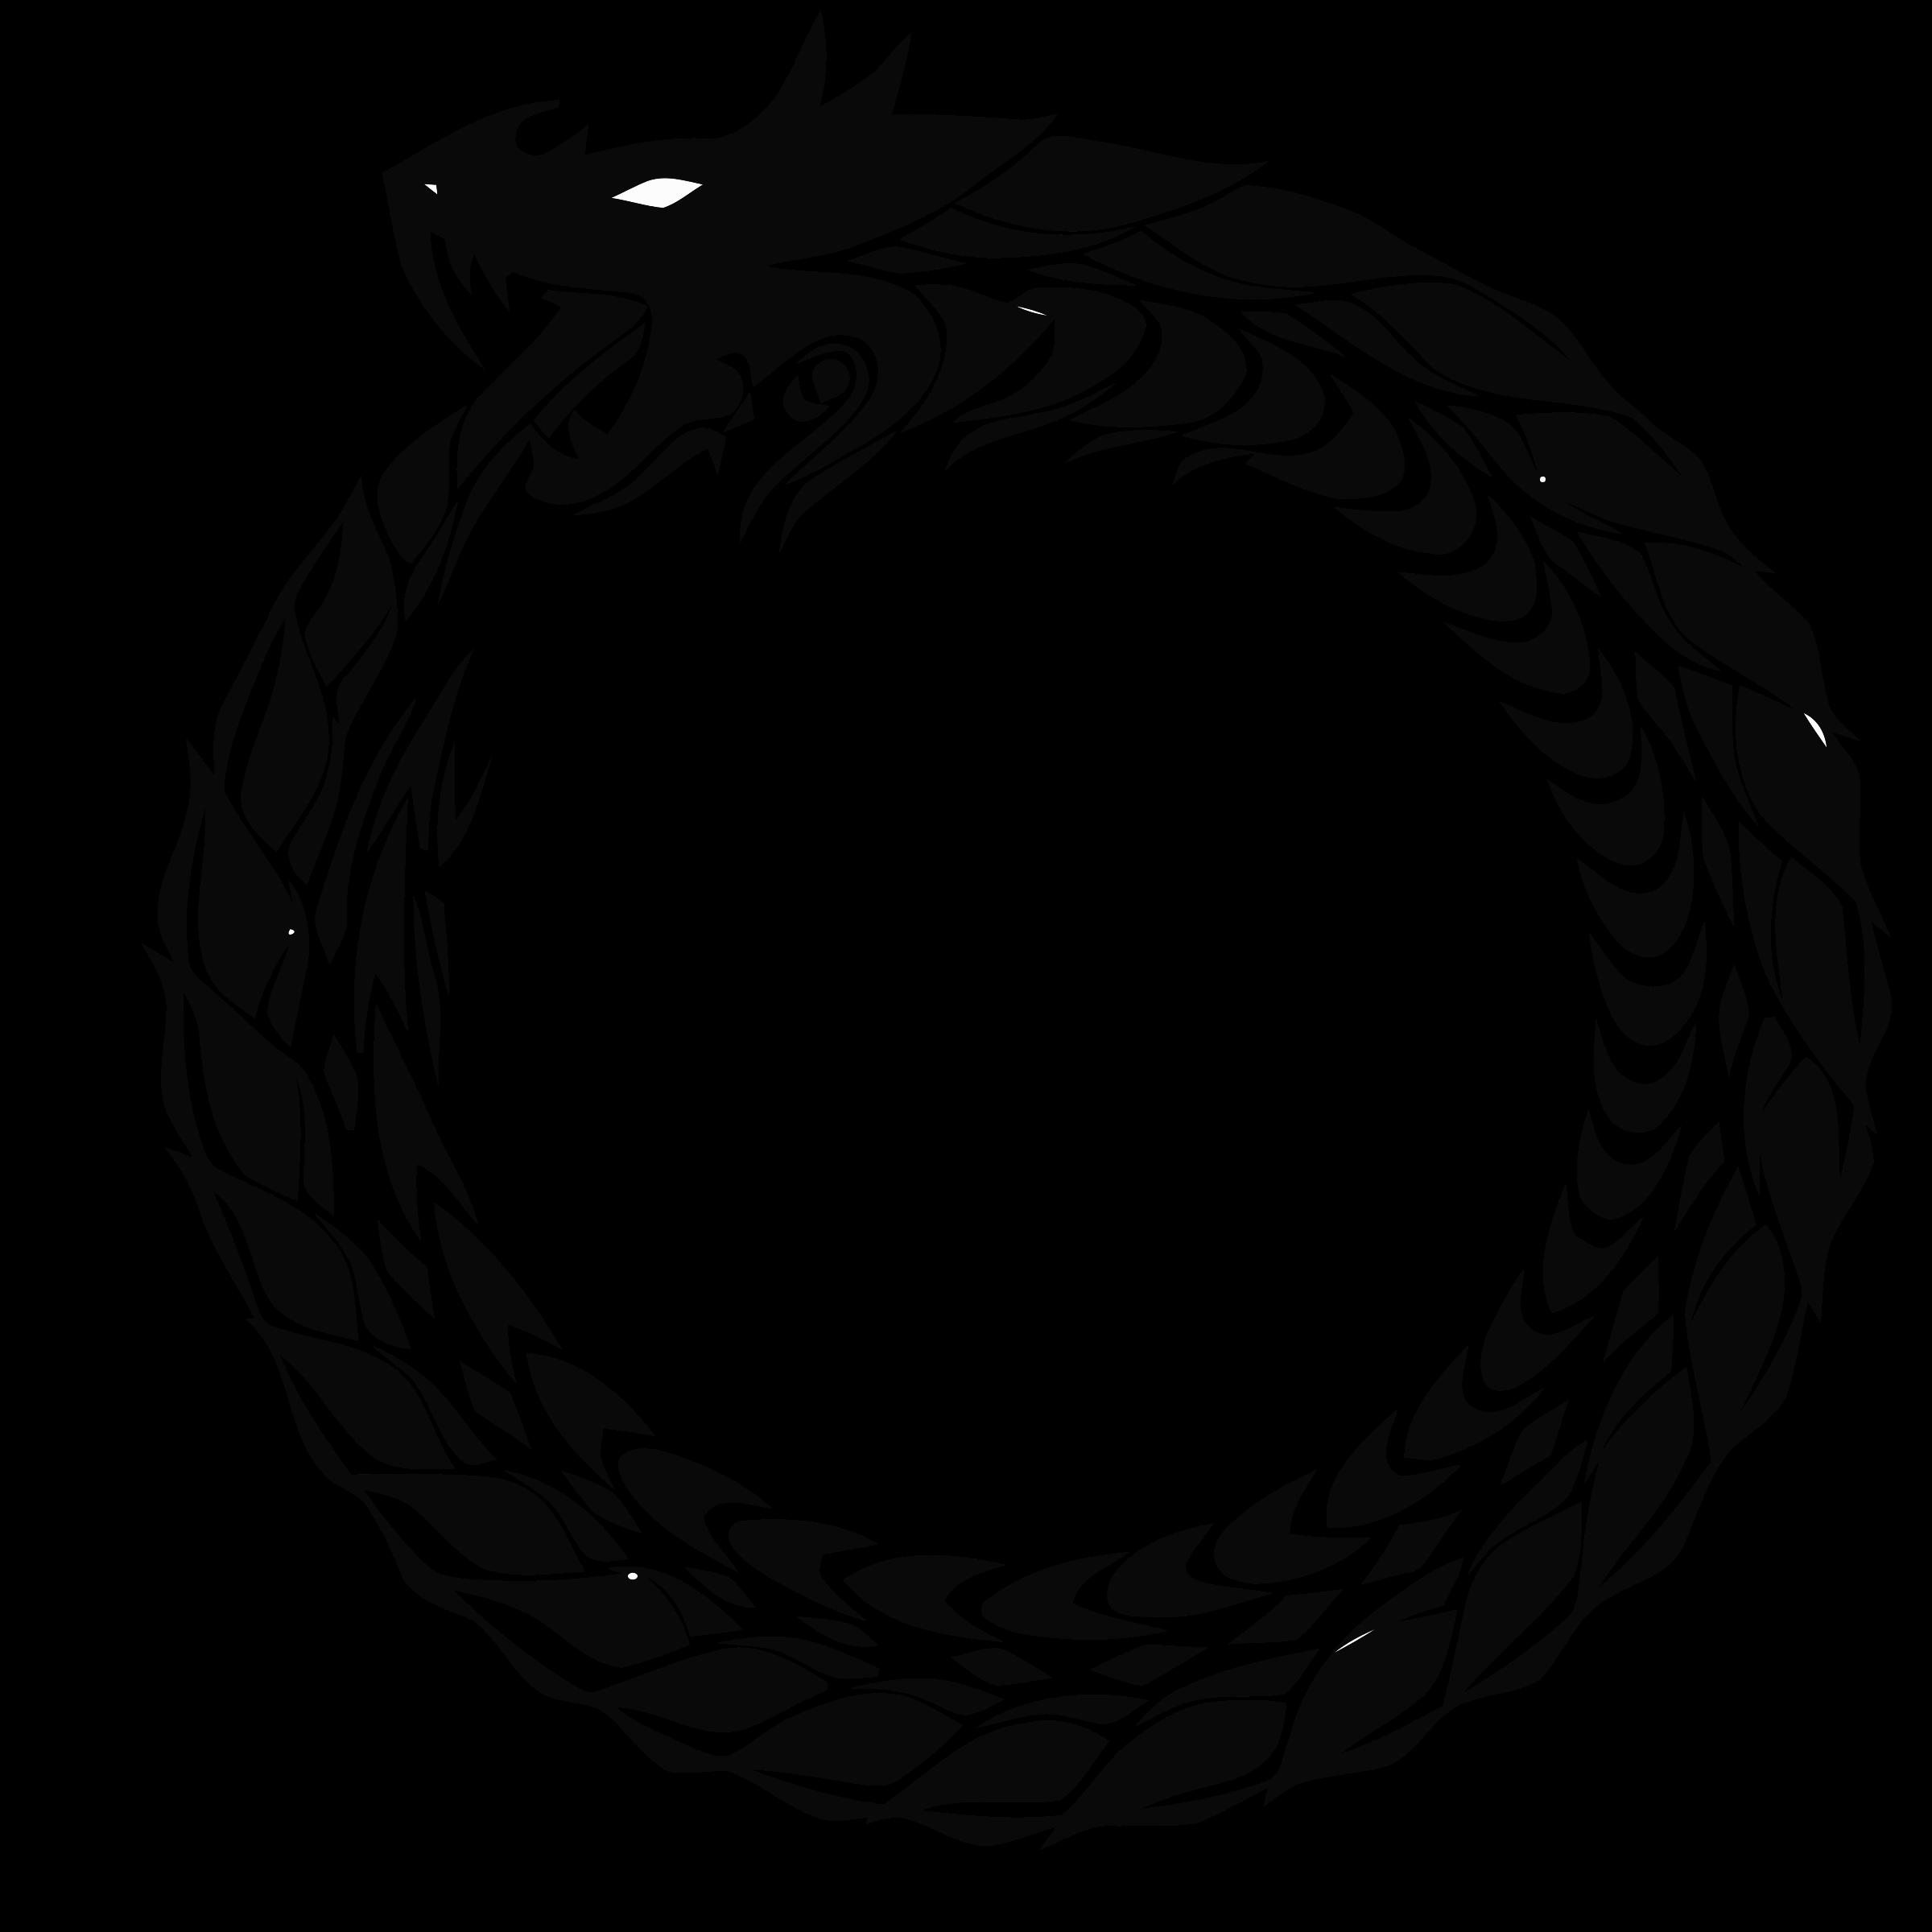 Ouroboros PNG Transparent Images.